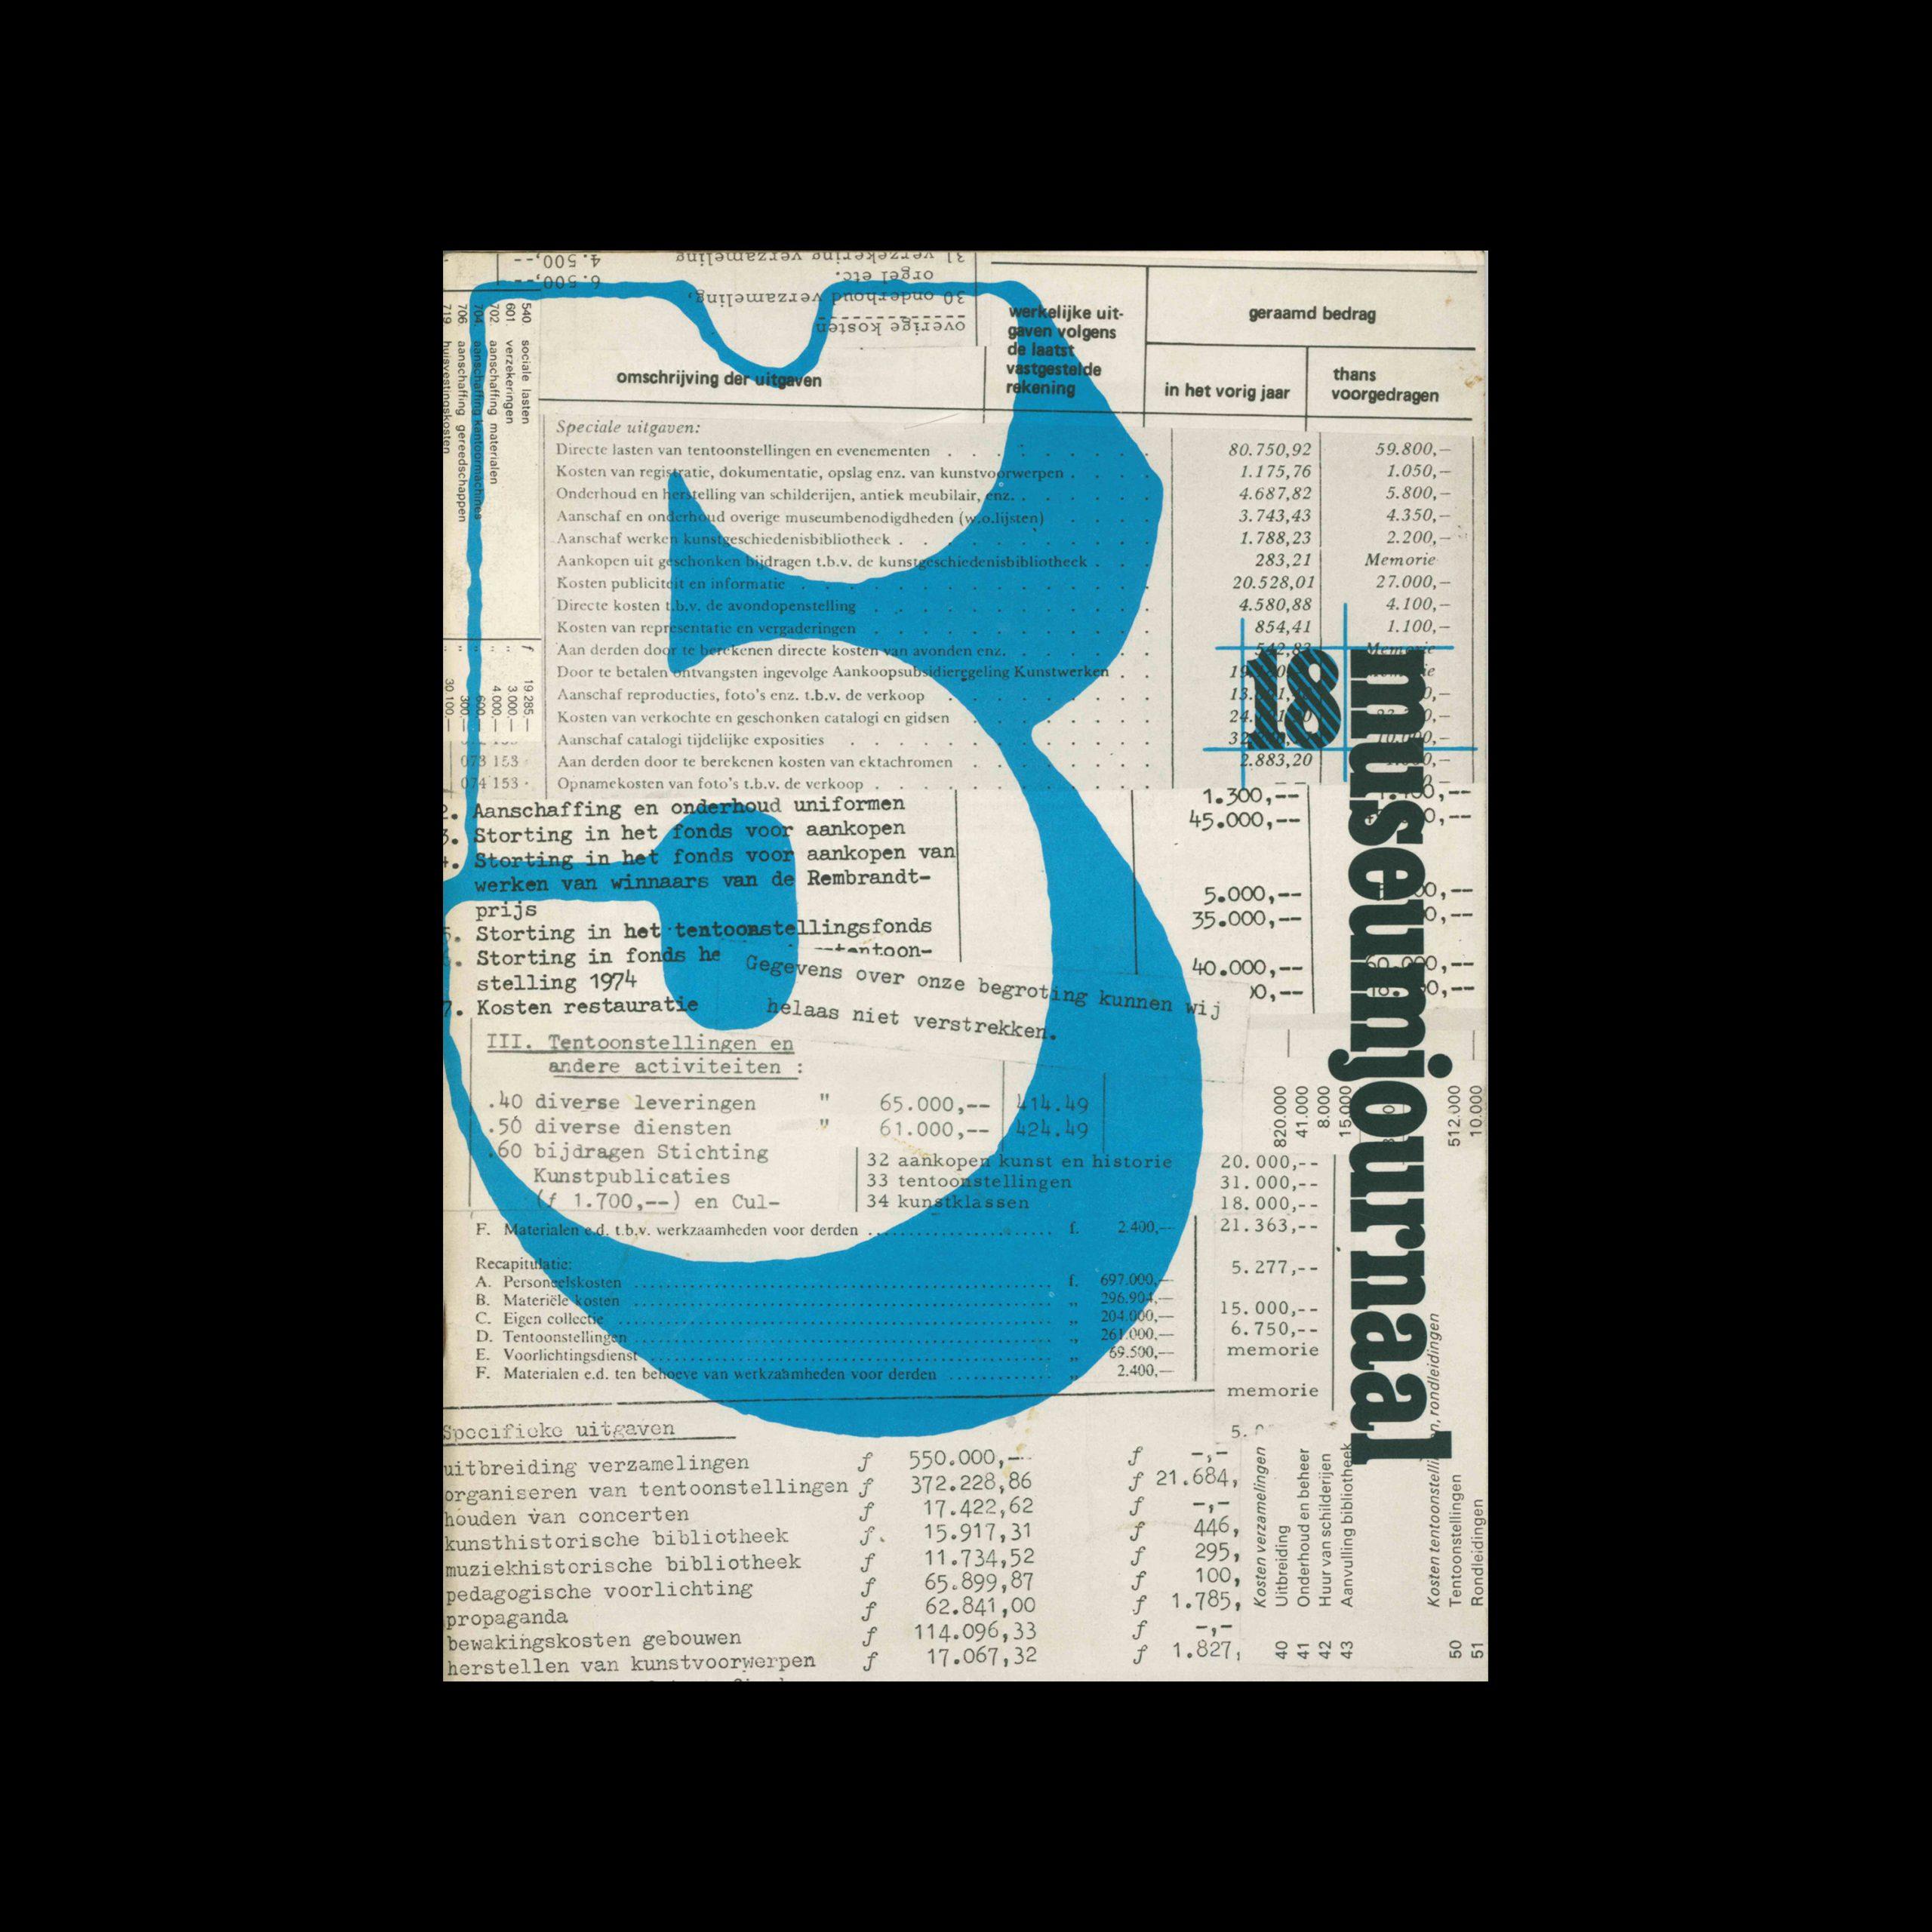 Museumjournaal, Serie 18 no5, 1973. Frank Steenhagen (cover), Jurriaan Schrofer (layout)